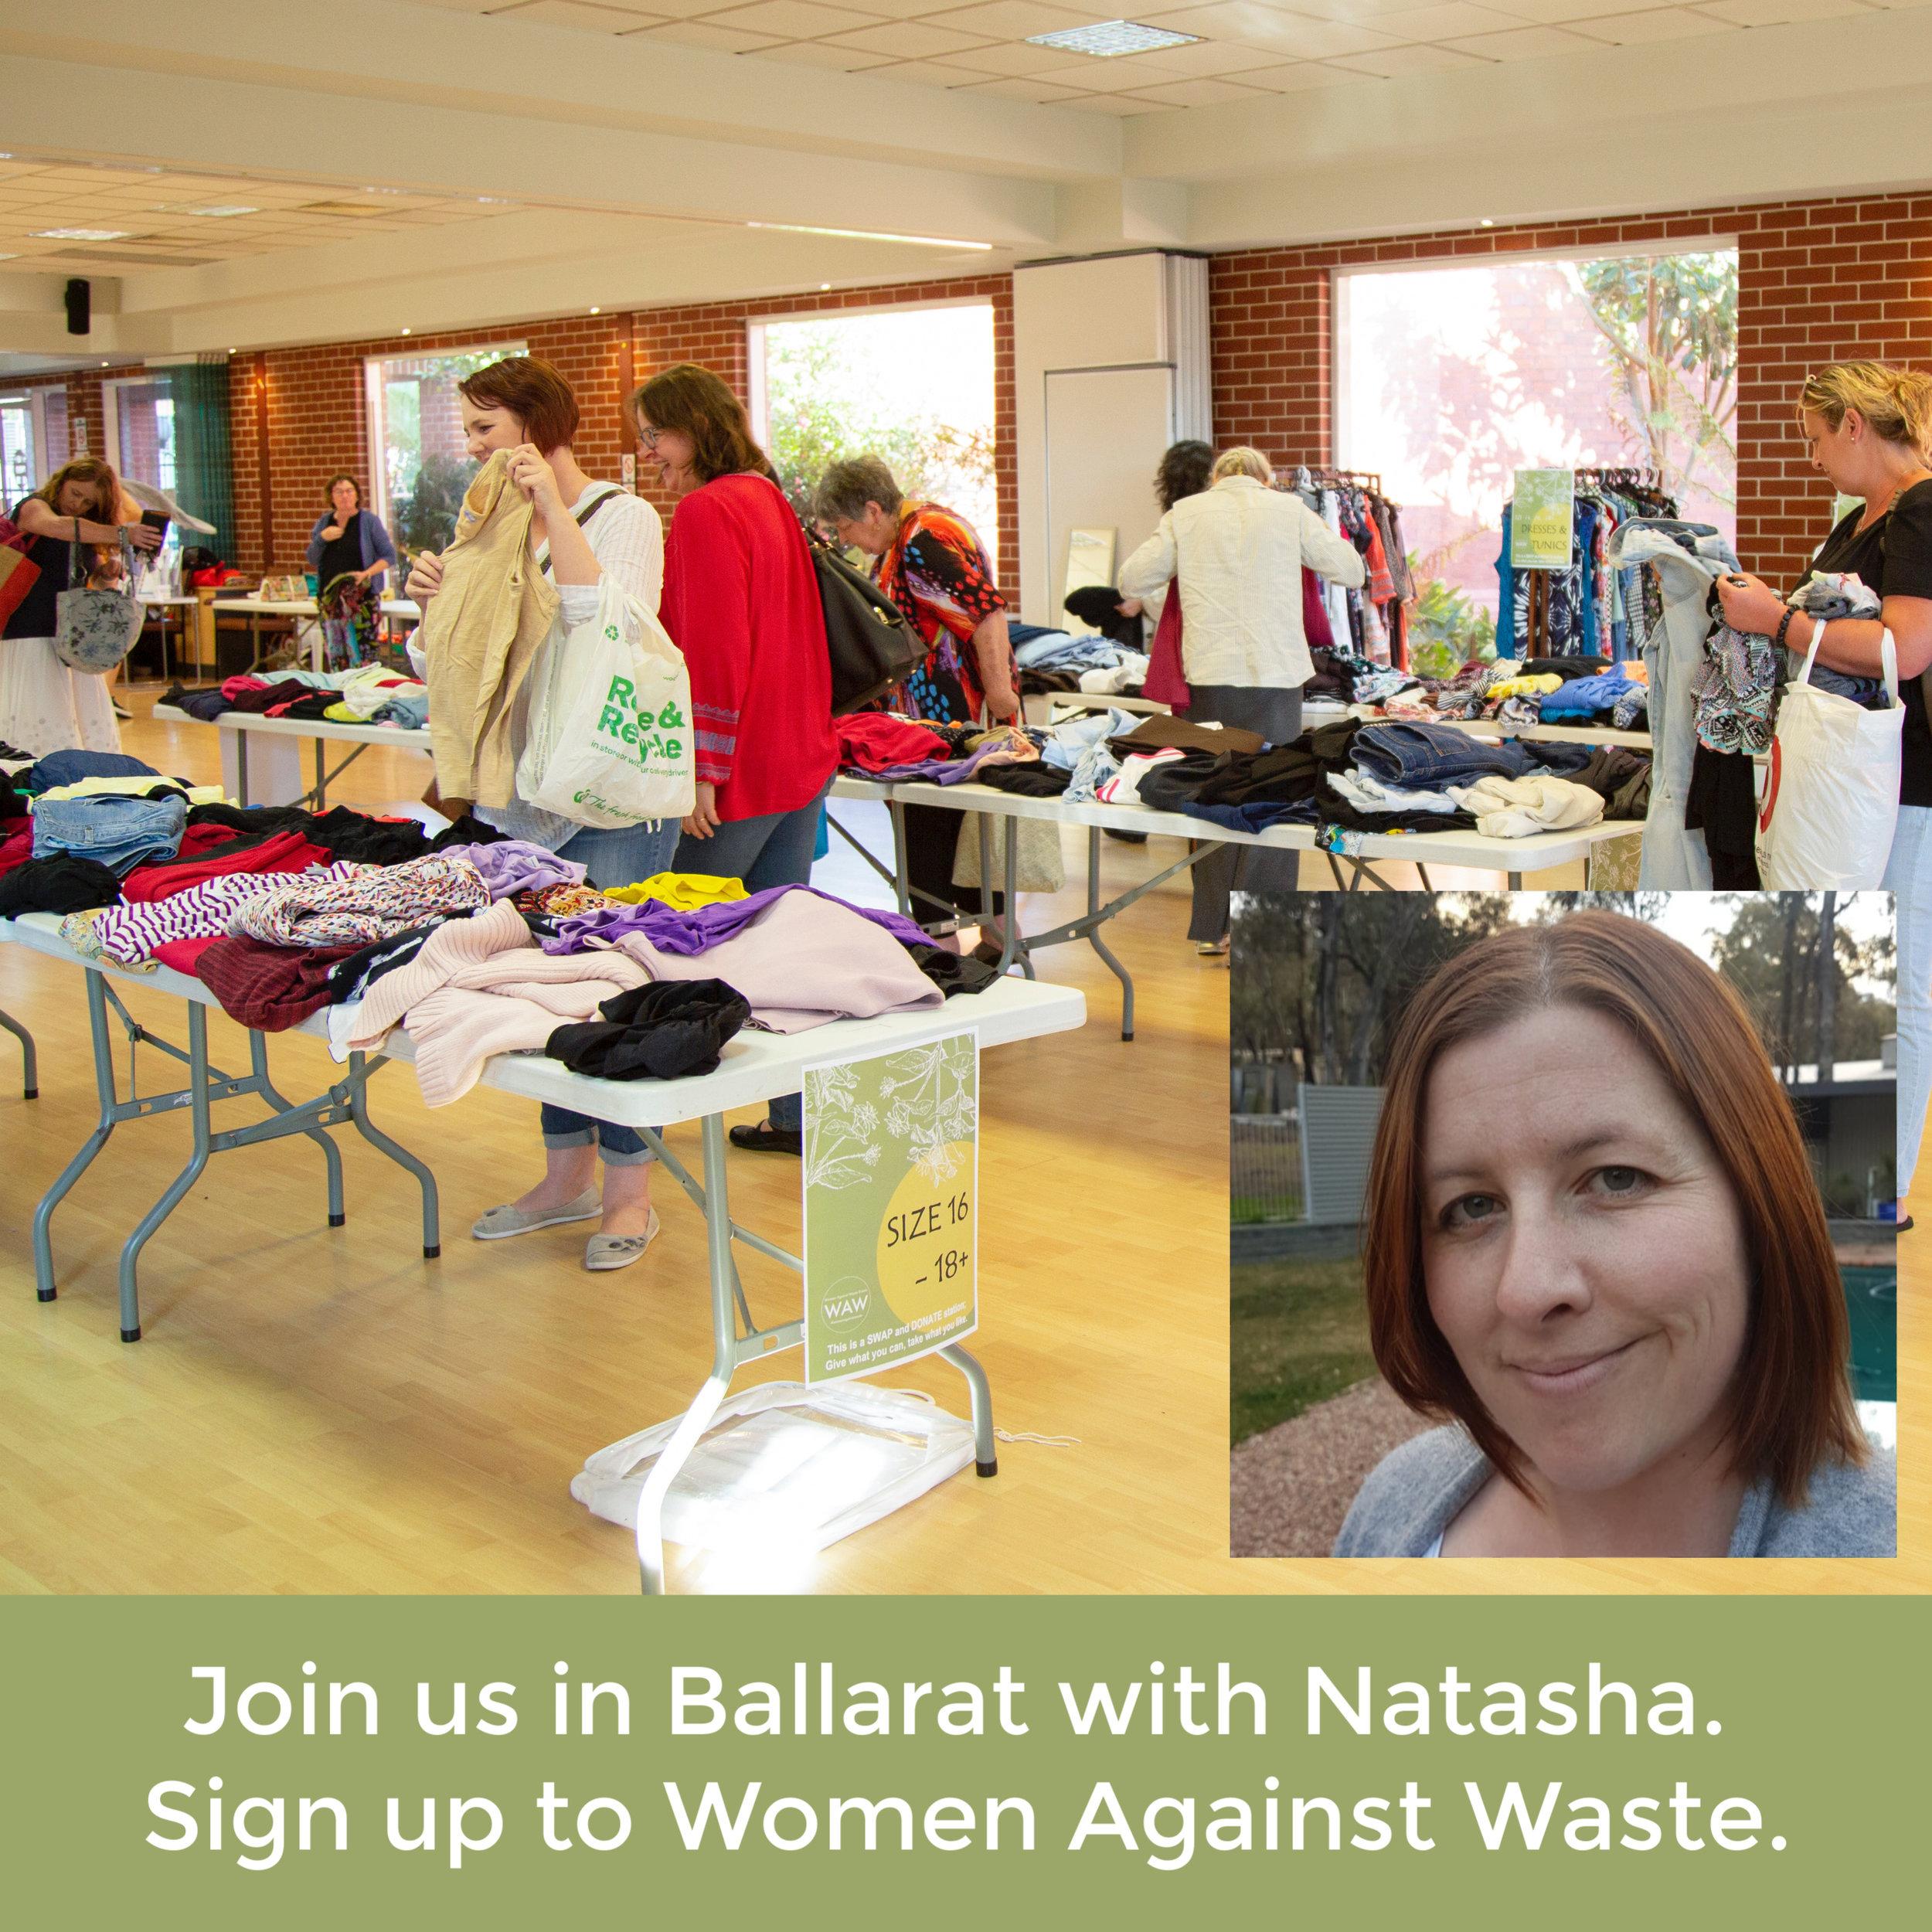 Ballarat WAW event